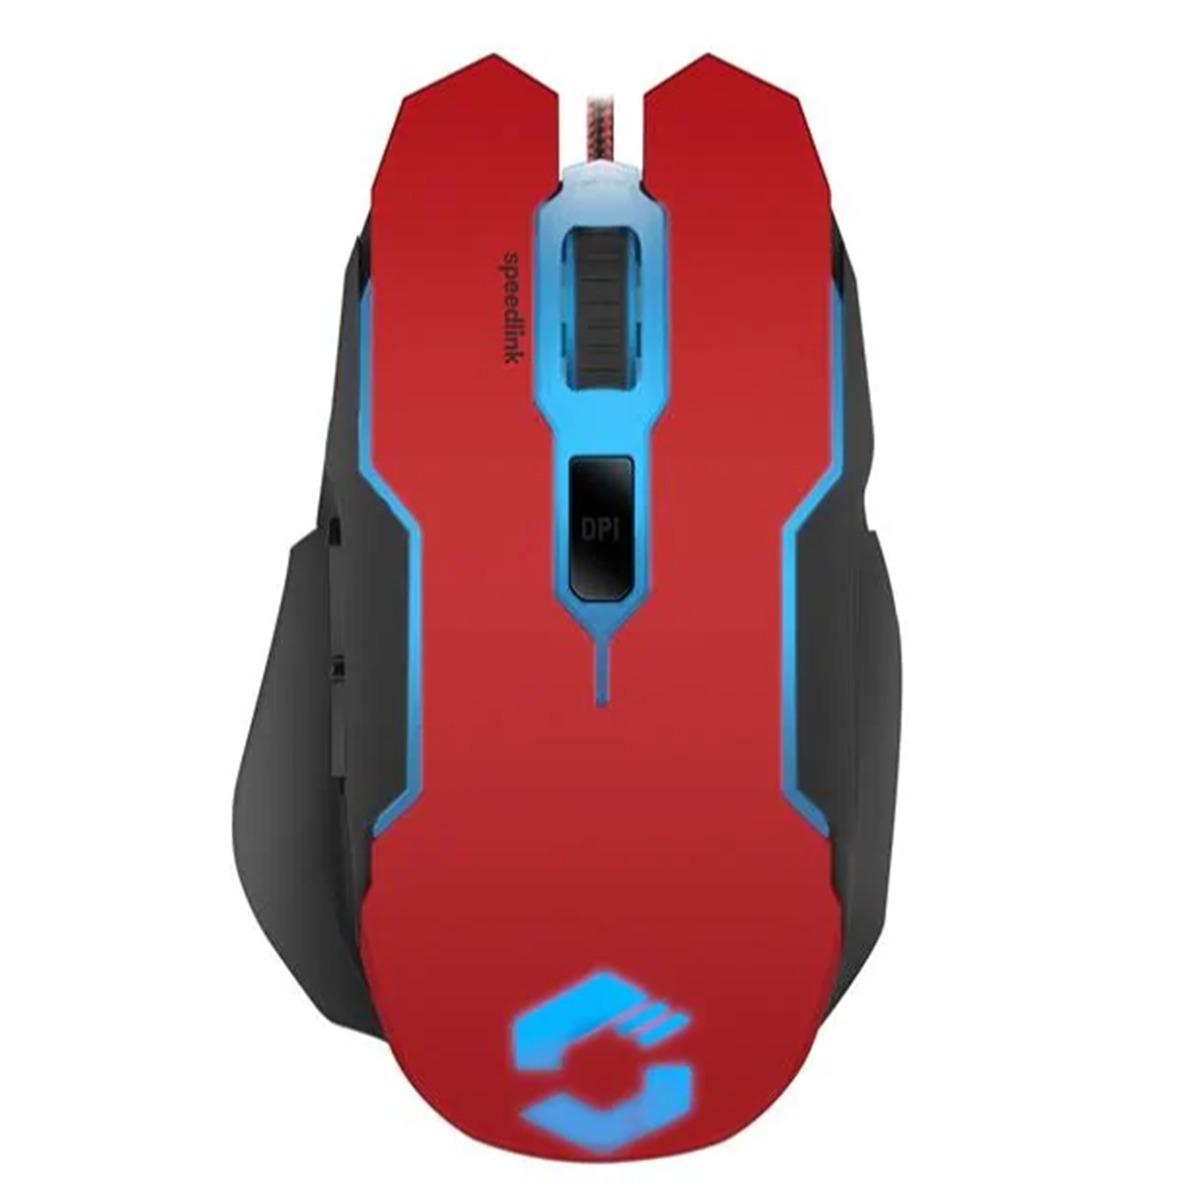 SpeedLink - Contus Gaming Mouse /Black-Red